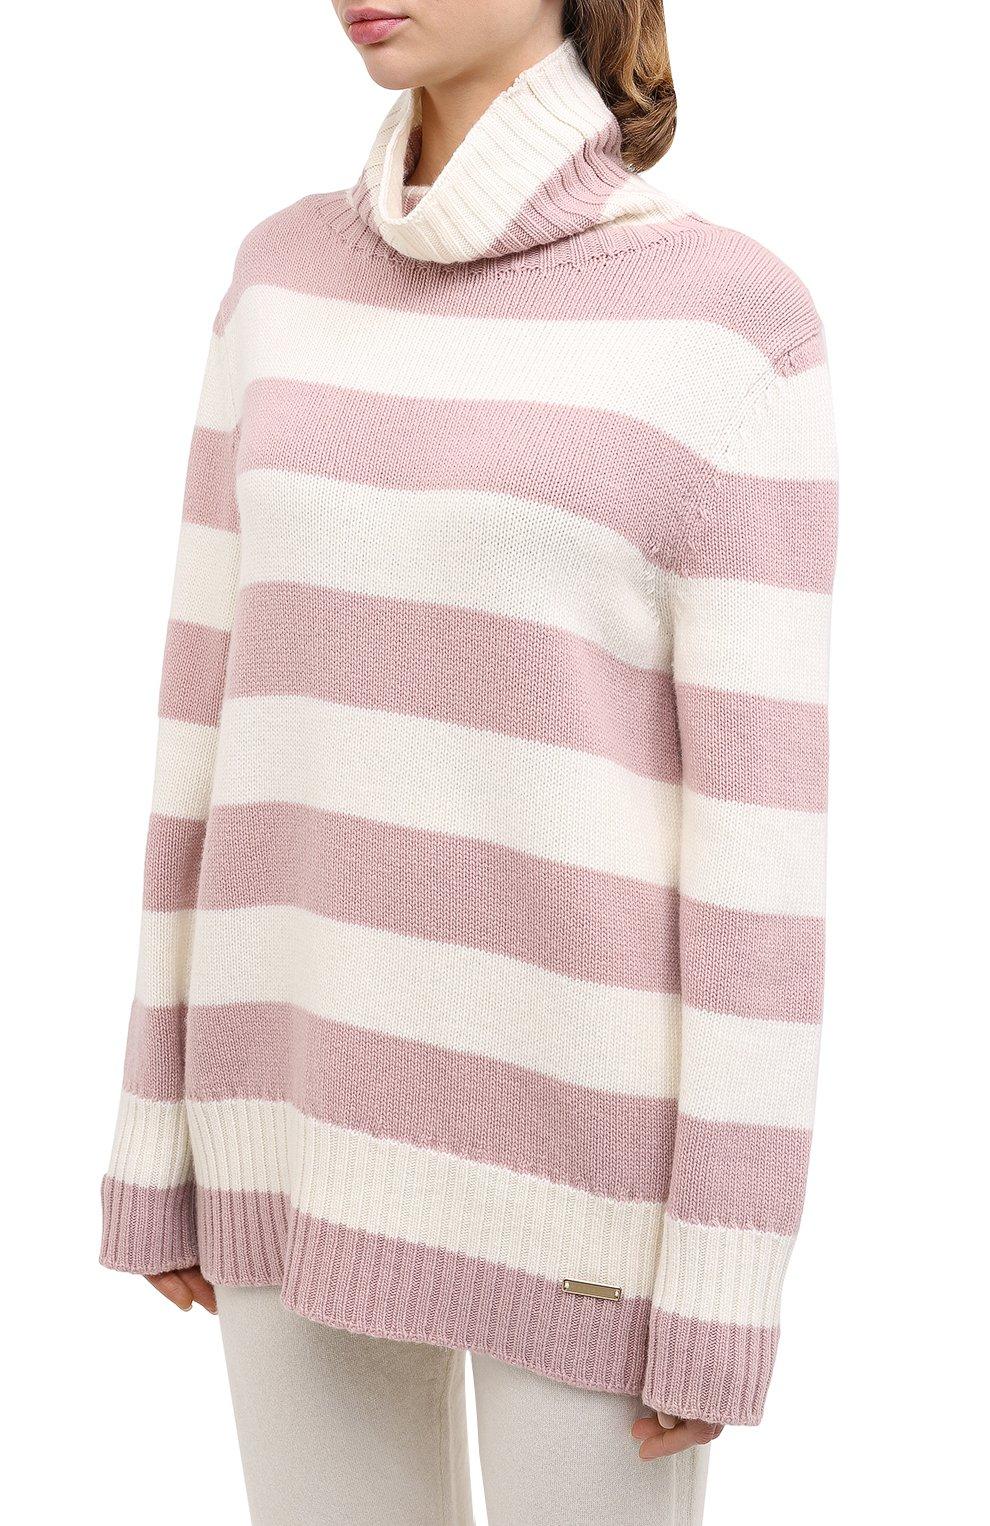 Женский свитер из шерсти и кашемира MANZONI24 светло-розового цвета, арт. 20M727-XR/38-46 | Фото 3